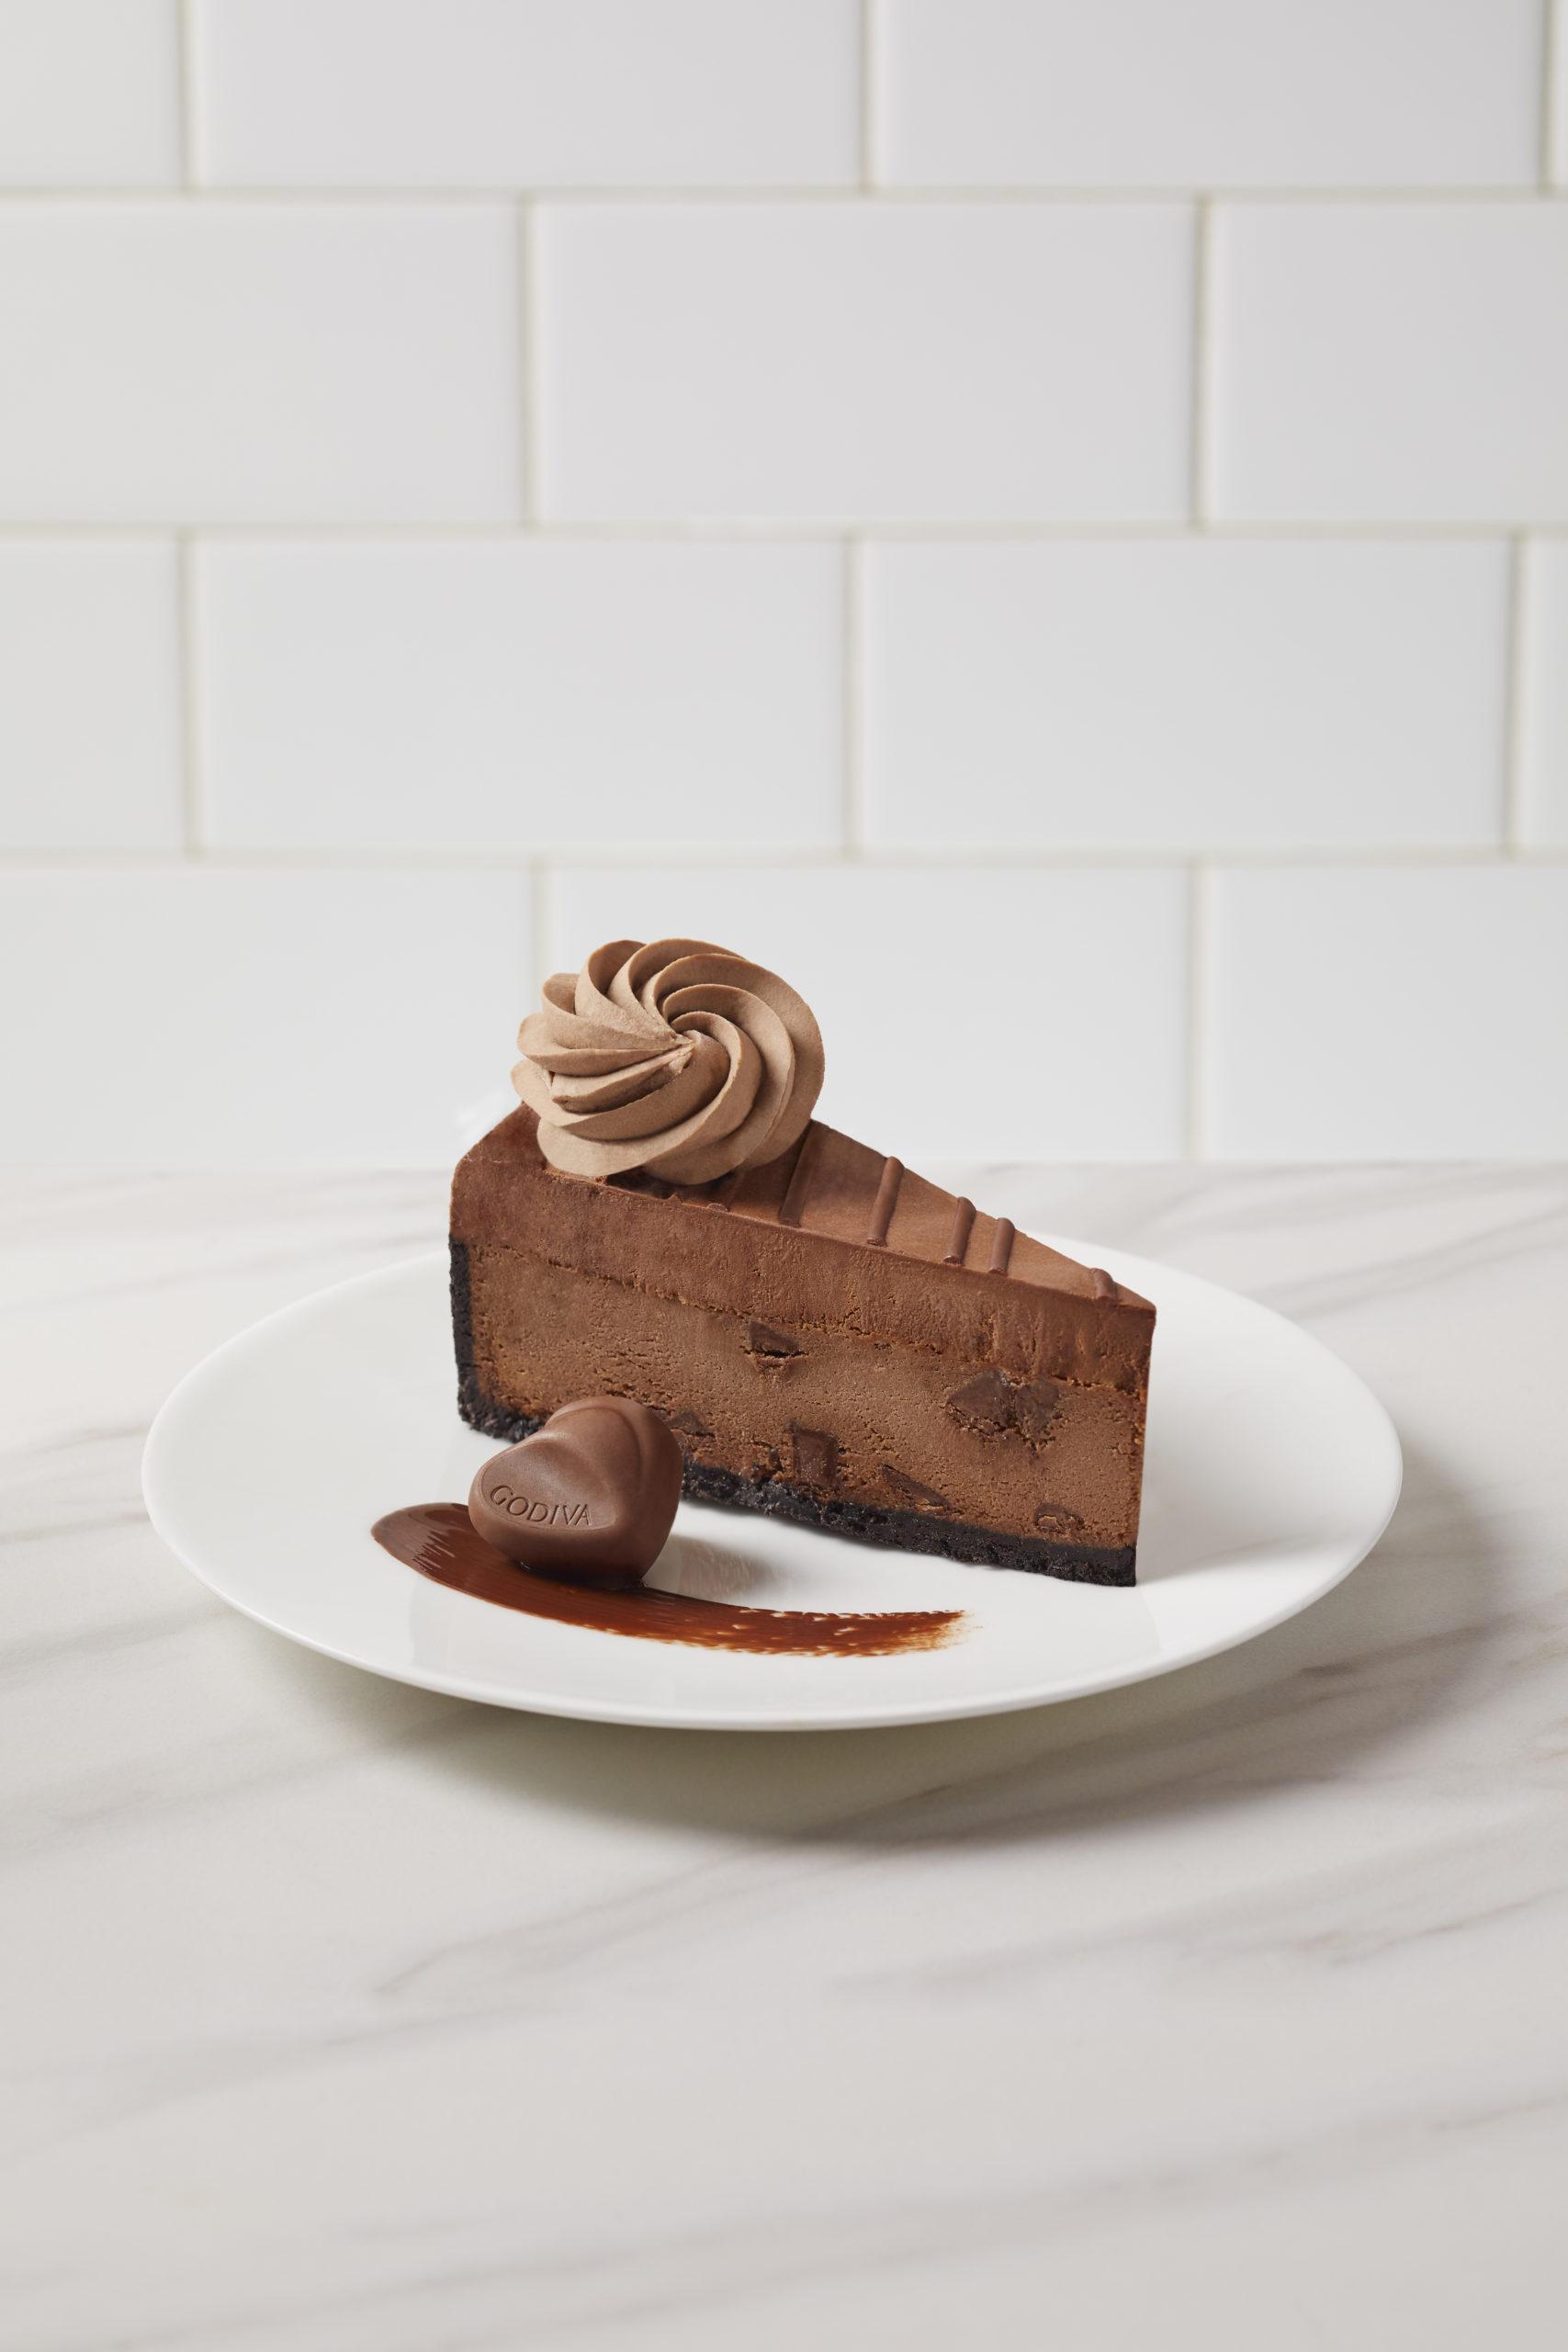 Cheesecake Factory creams uk